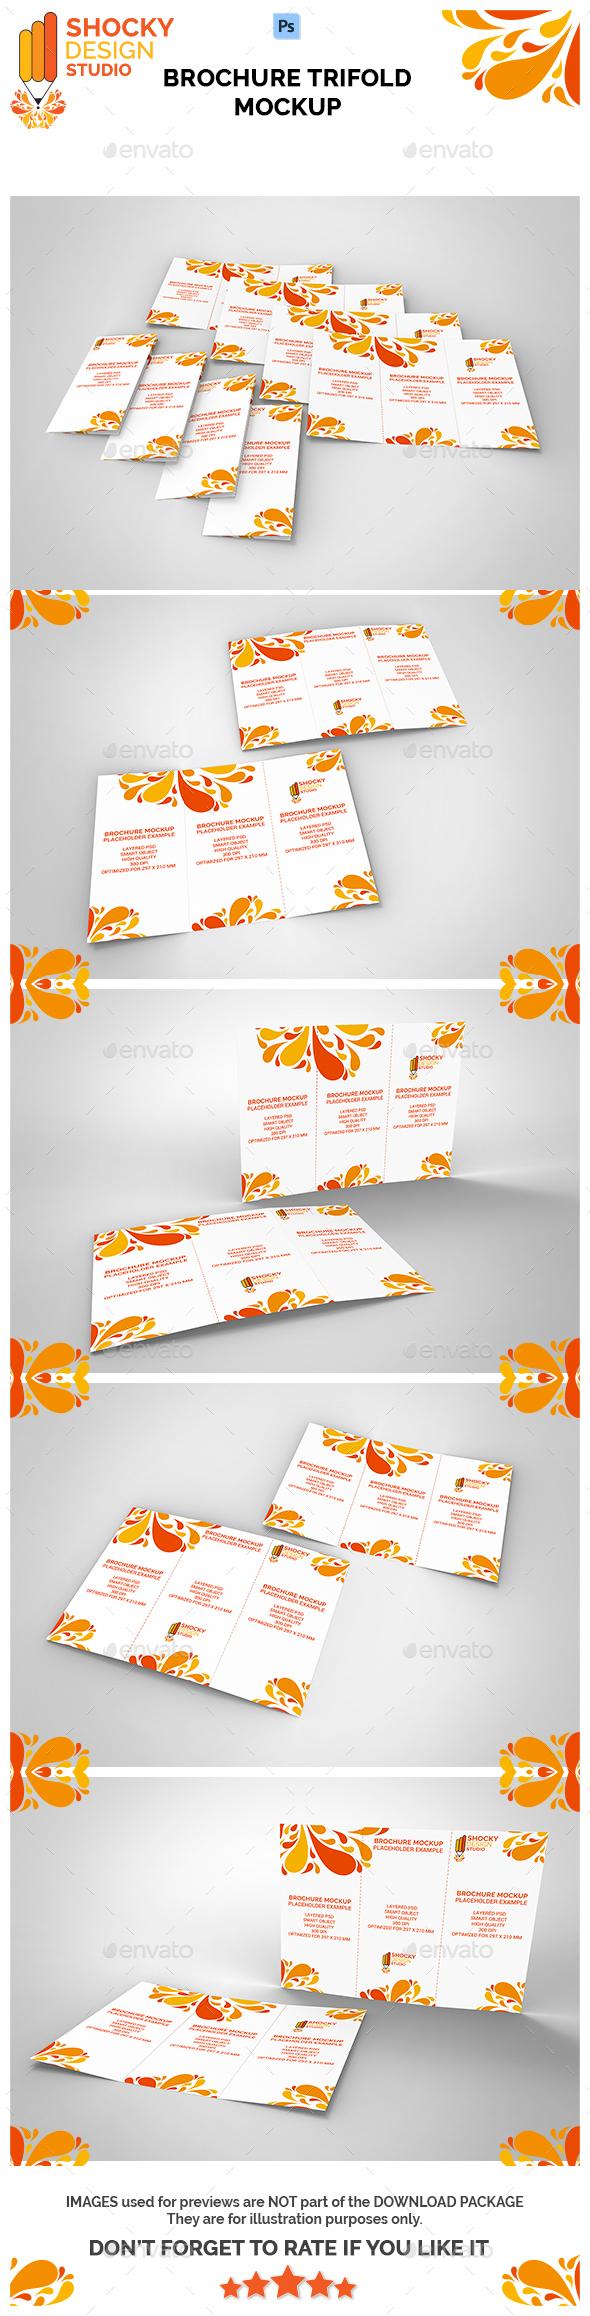 Brochure Trifold Mockup - Brochures Print